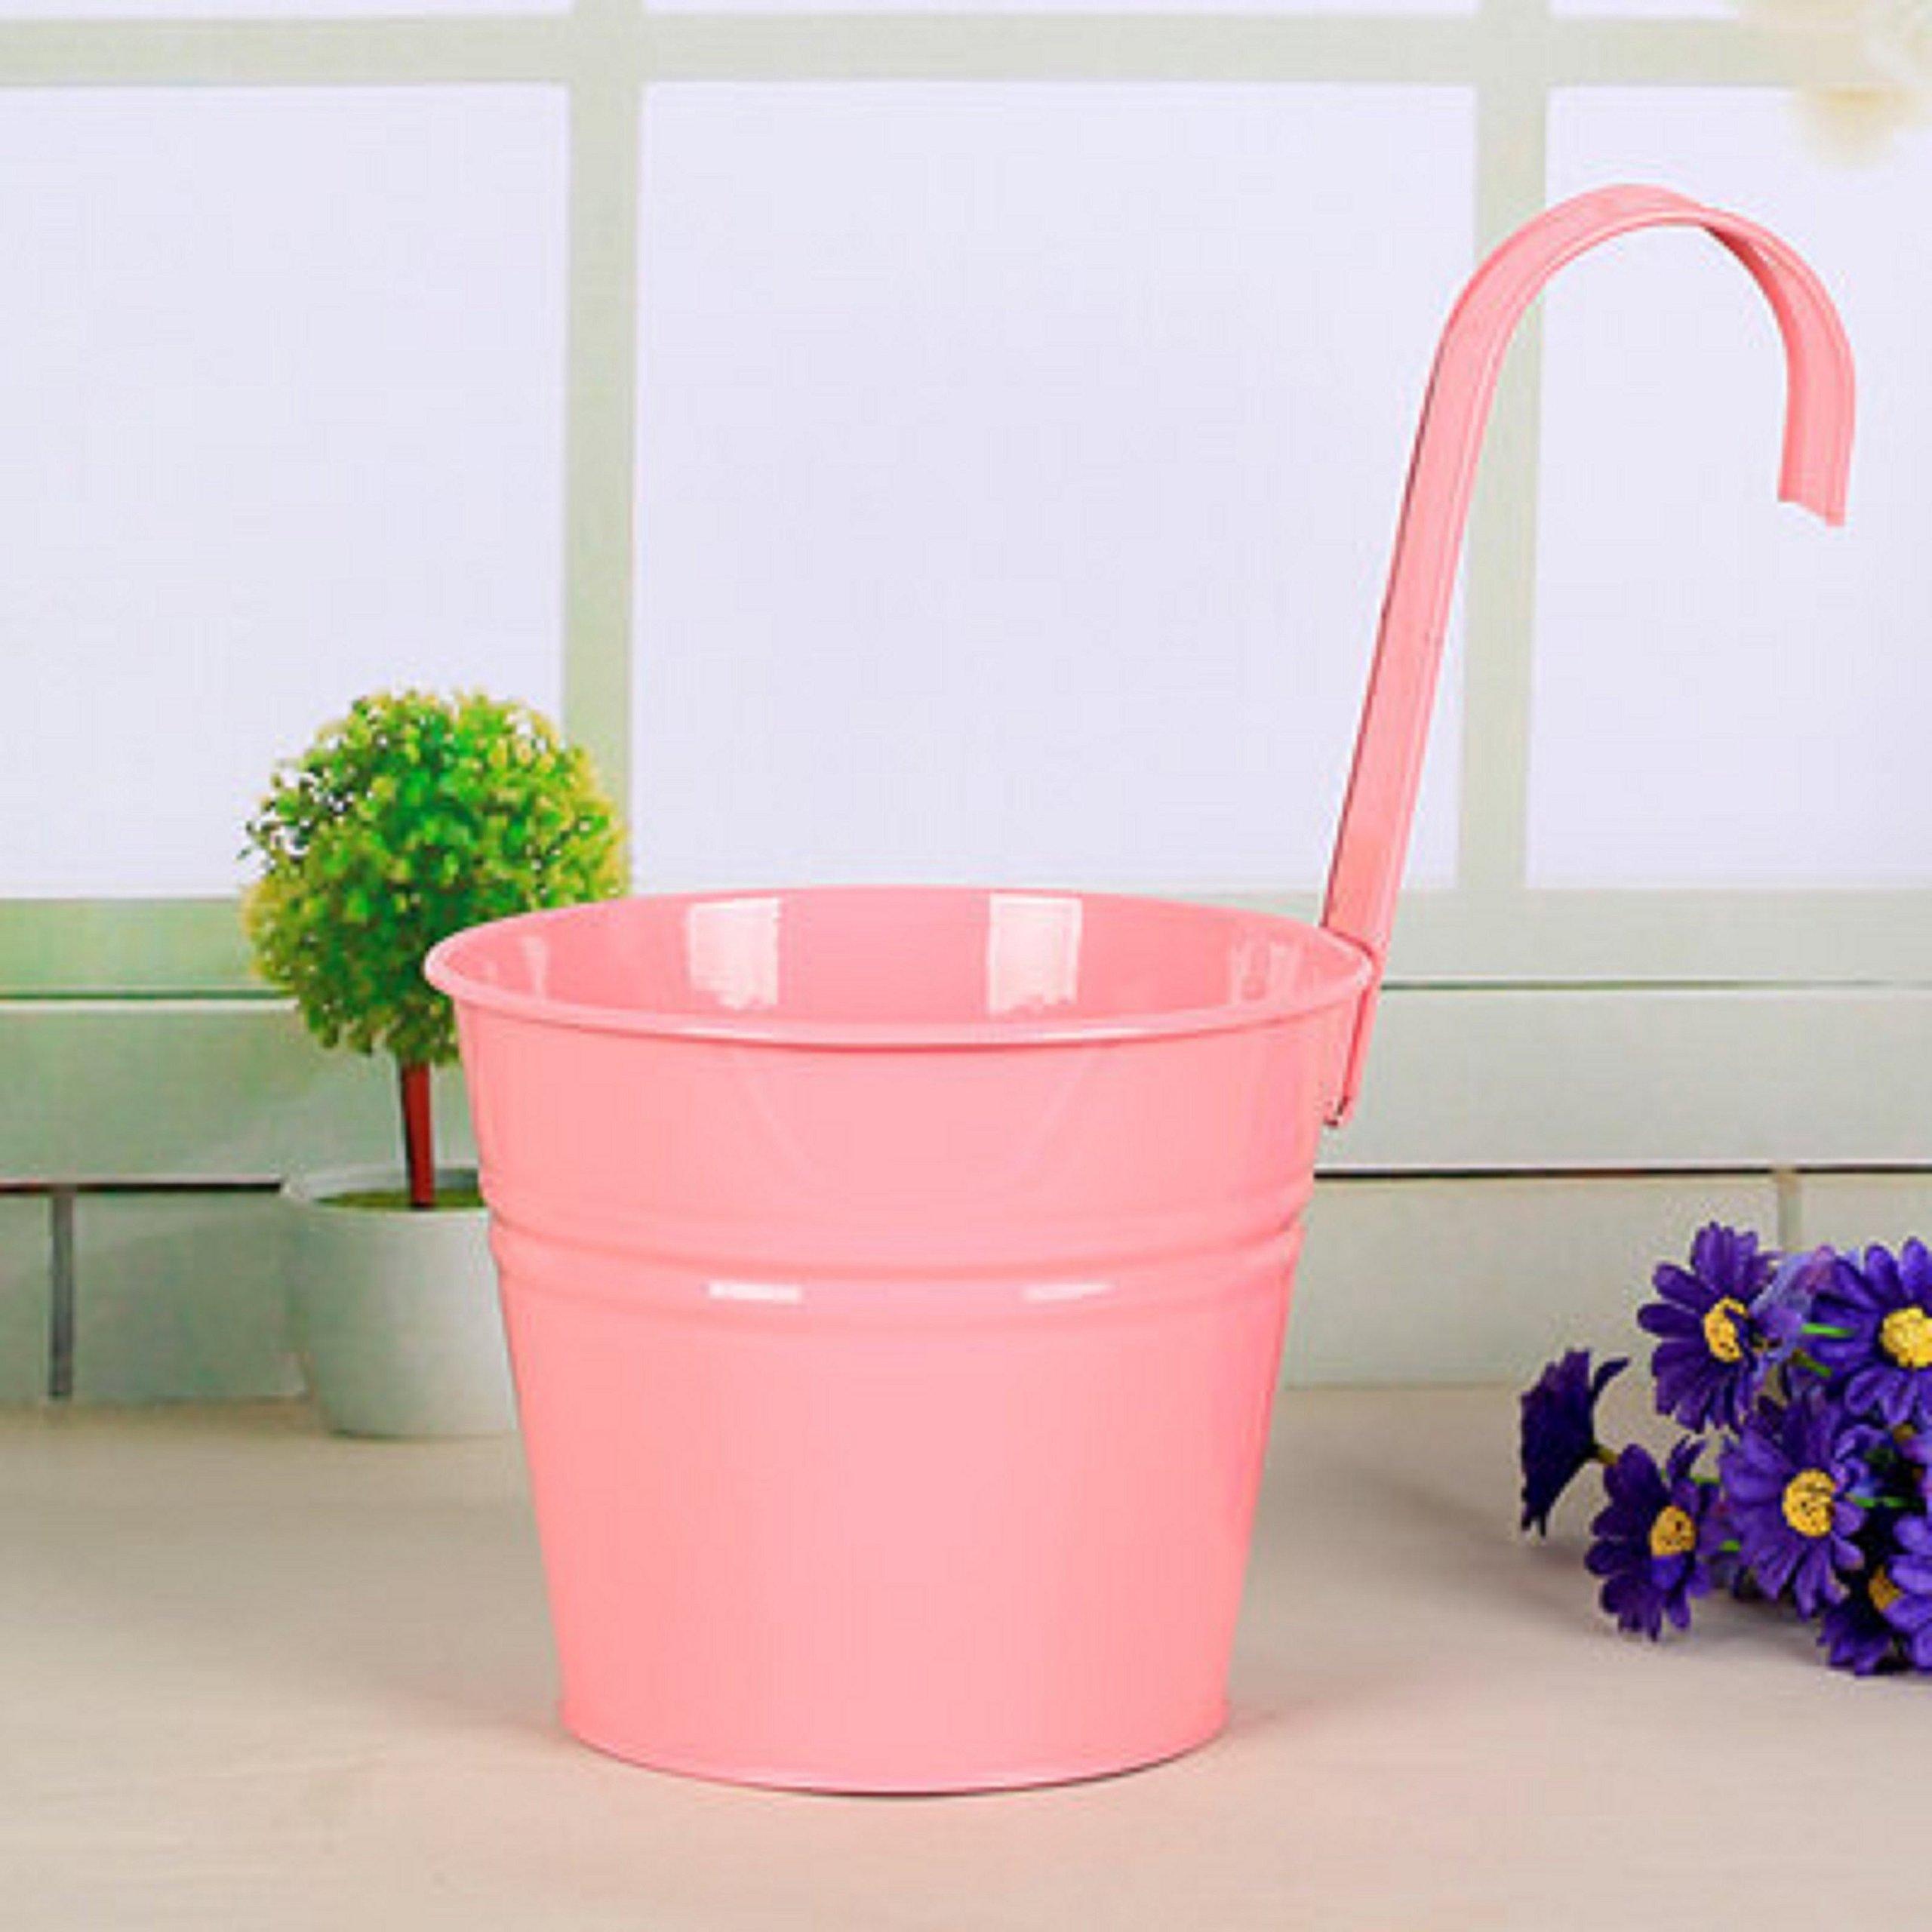 Mr. Garden 6 Inch Flower Pots Garden Pots Balcony Hanging Planter Iron Bucket Holders, 3pack, Pink